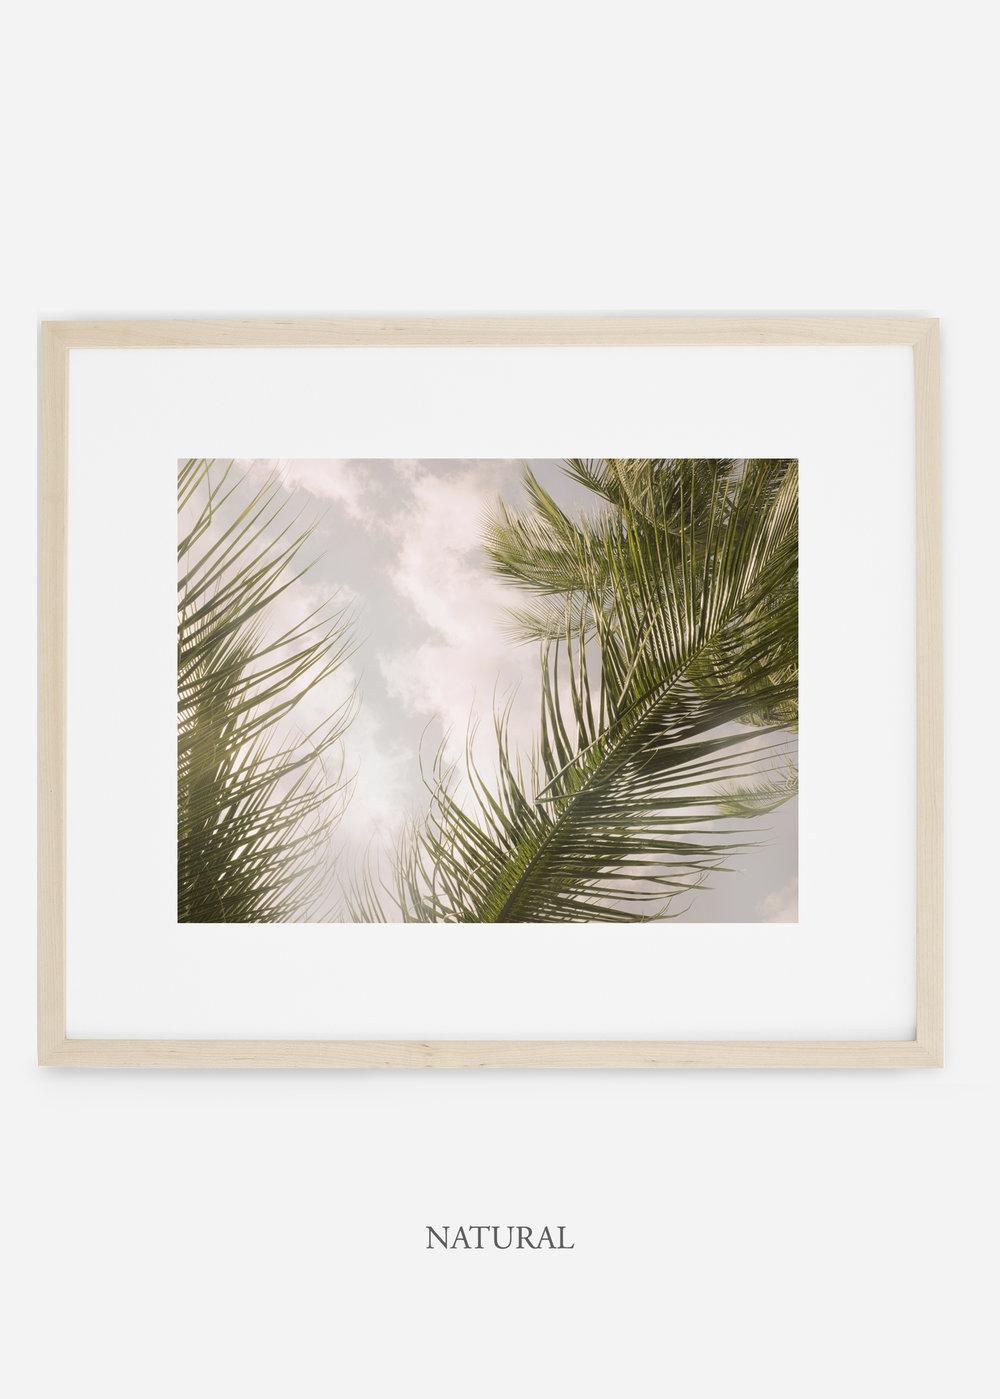 interiordesign_naturalframe_AiryPalmTreeNo.1_art_tropical_palmtree_StormyGrayPalm.jpg